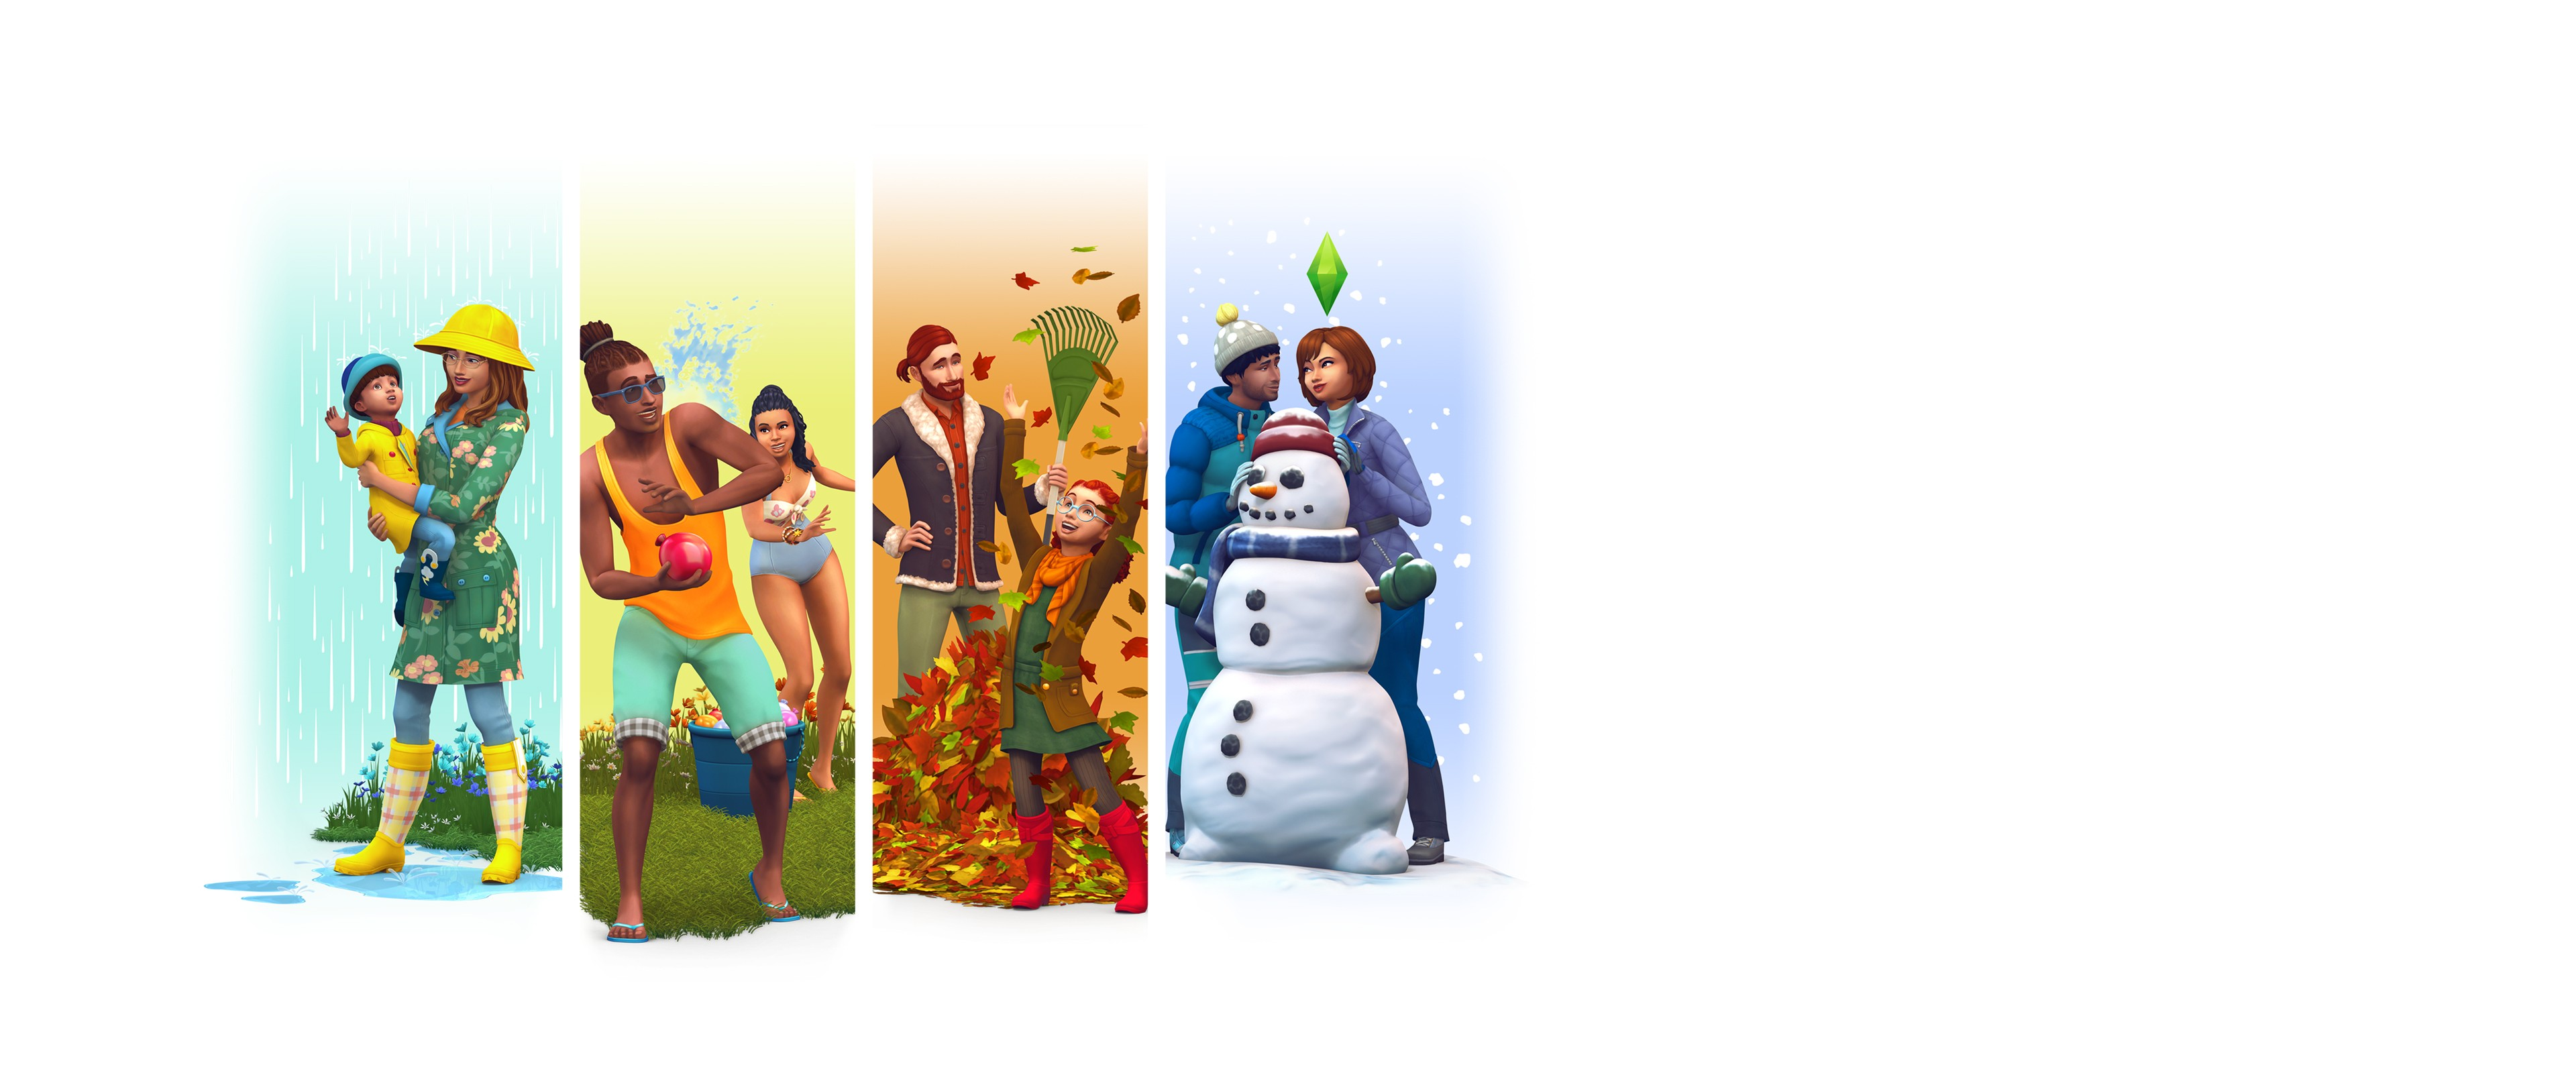 Sims 3 online dating uden årstider